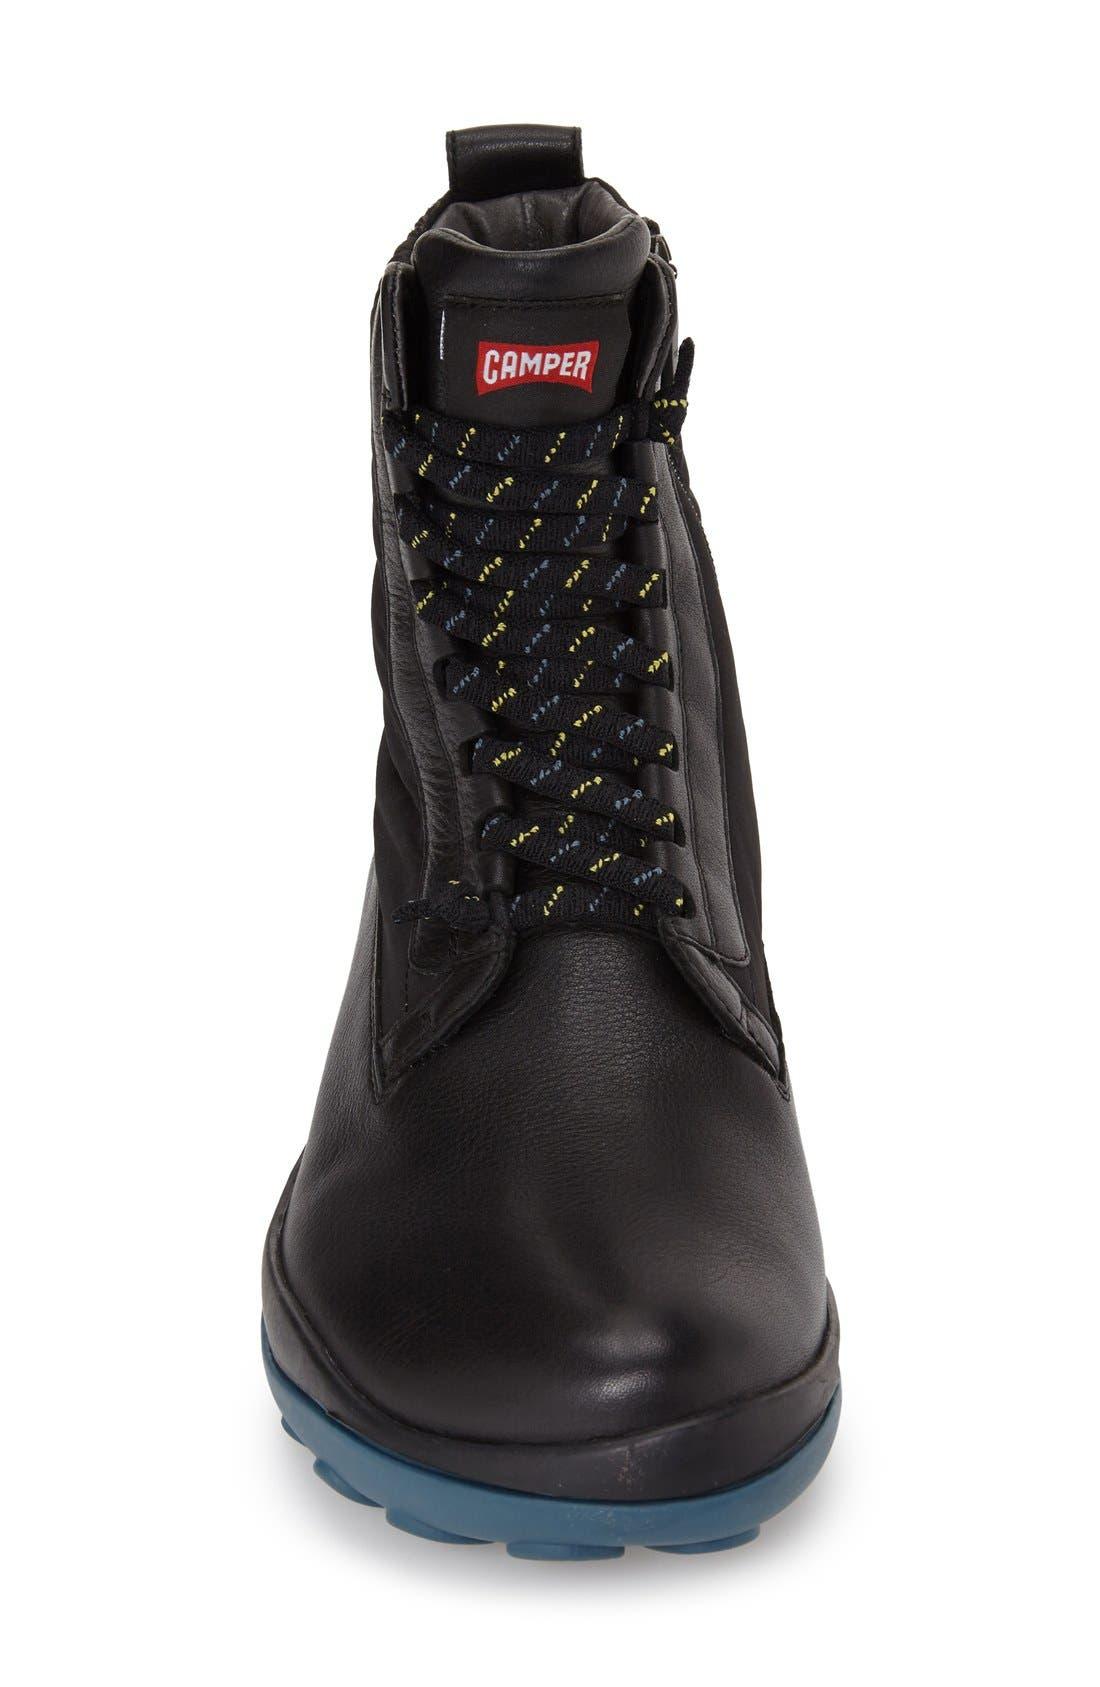 CAMPER,                             'Peu Pista' Gore-Tex<sup>®</sup> Boot,                             Alternate thumbnail 2, color,                             001